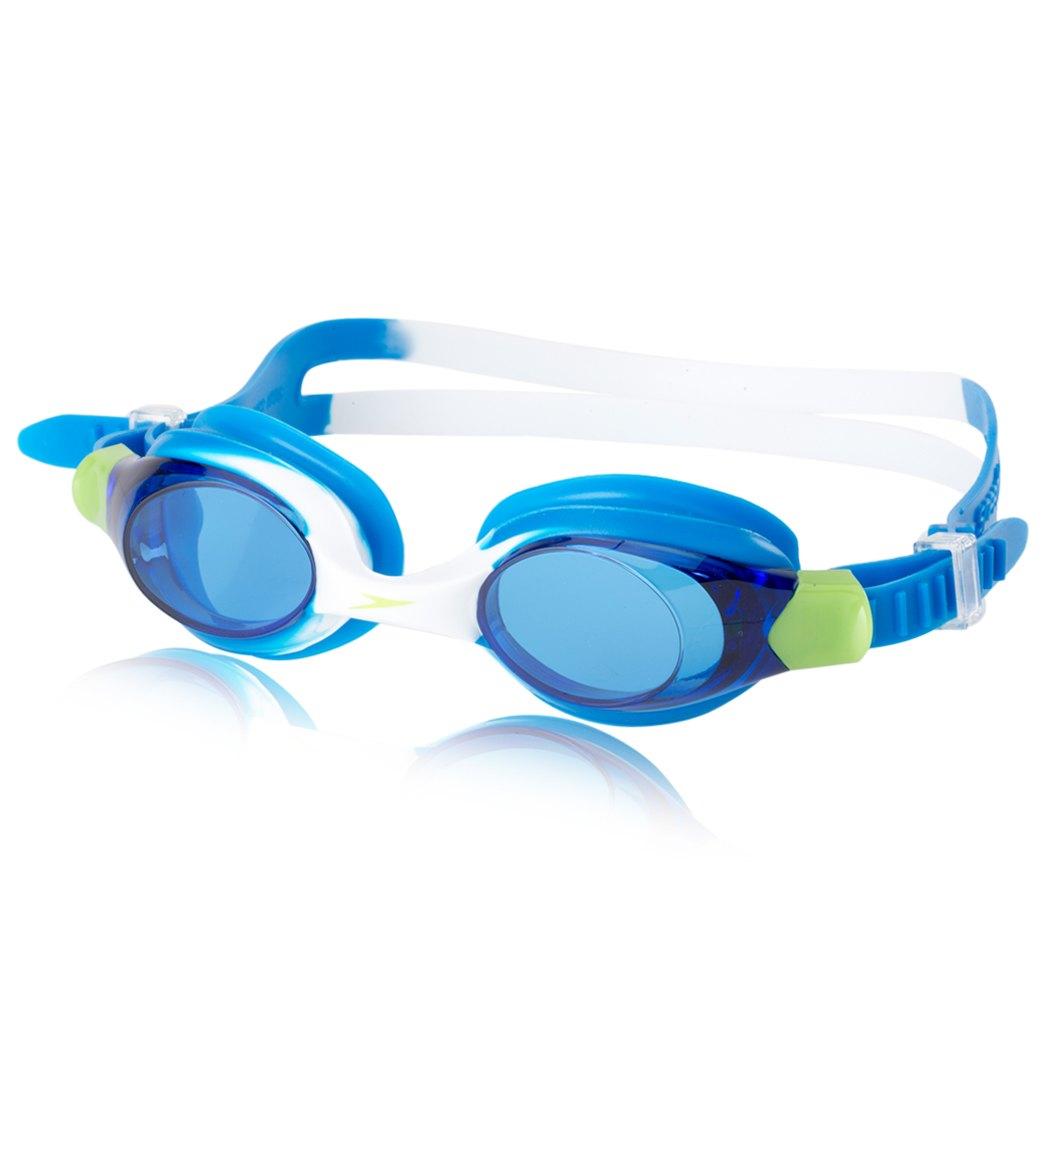 Speedo Skoogles Toddler Swimming Goggles